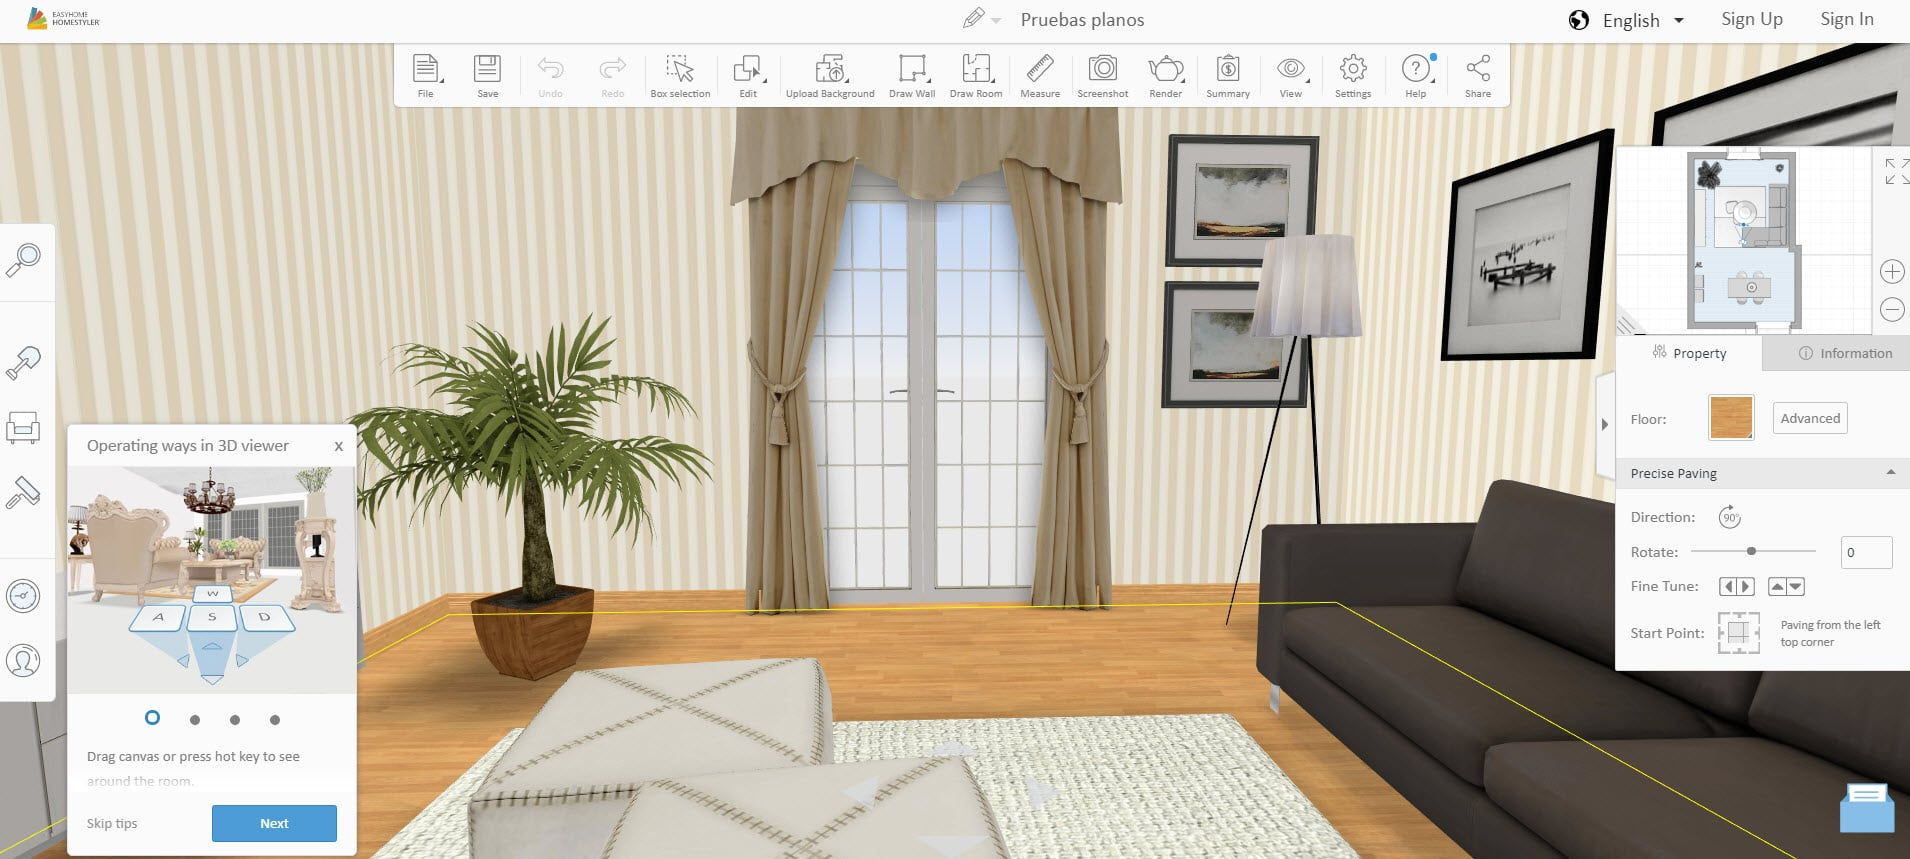 10 aplicaciones dise o de planos e interiores construye for App para decorar casas